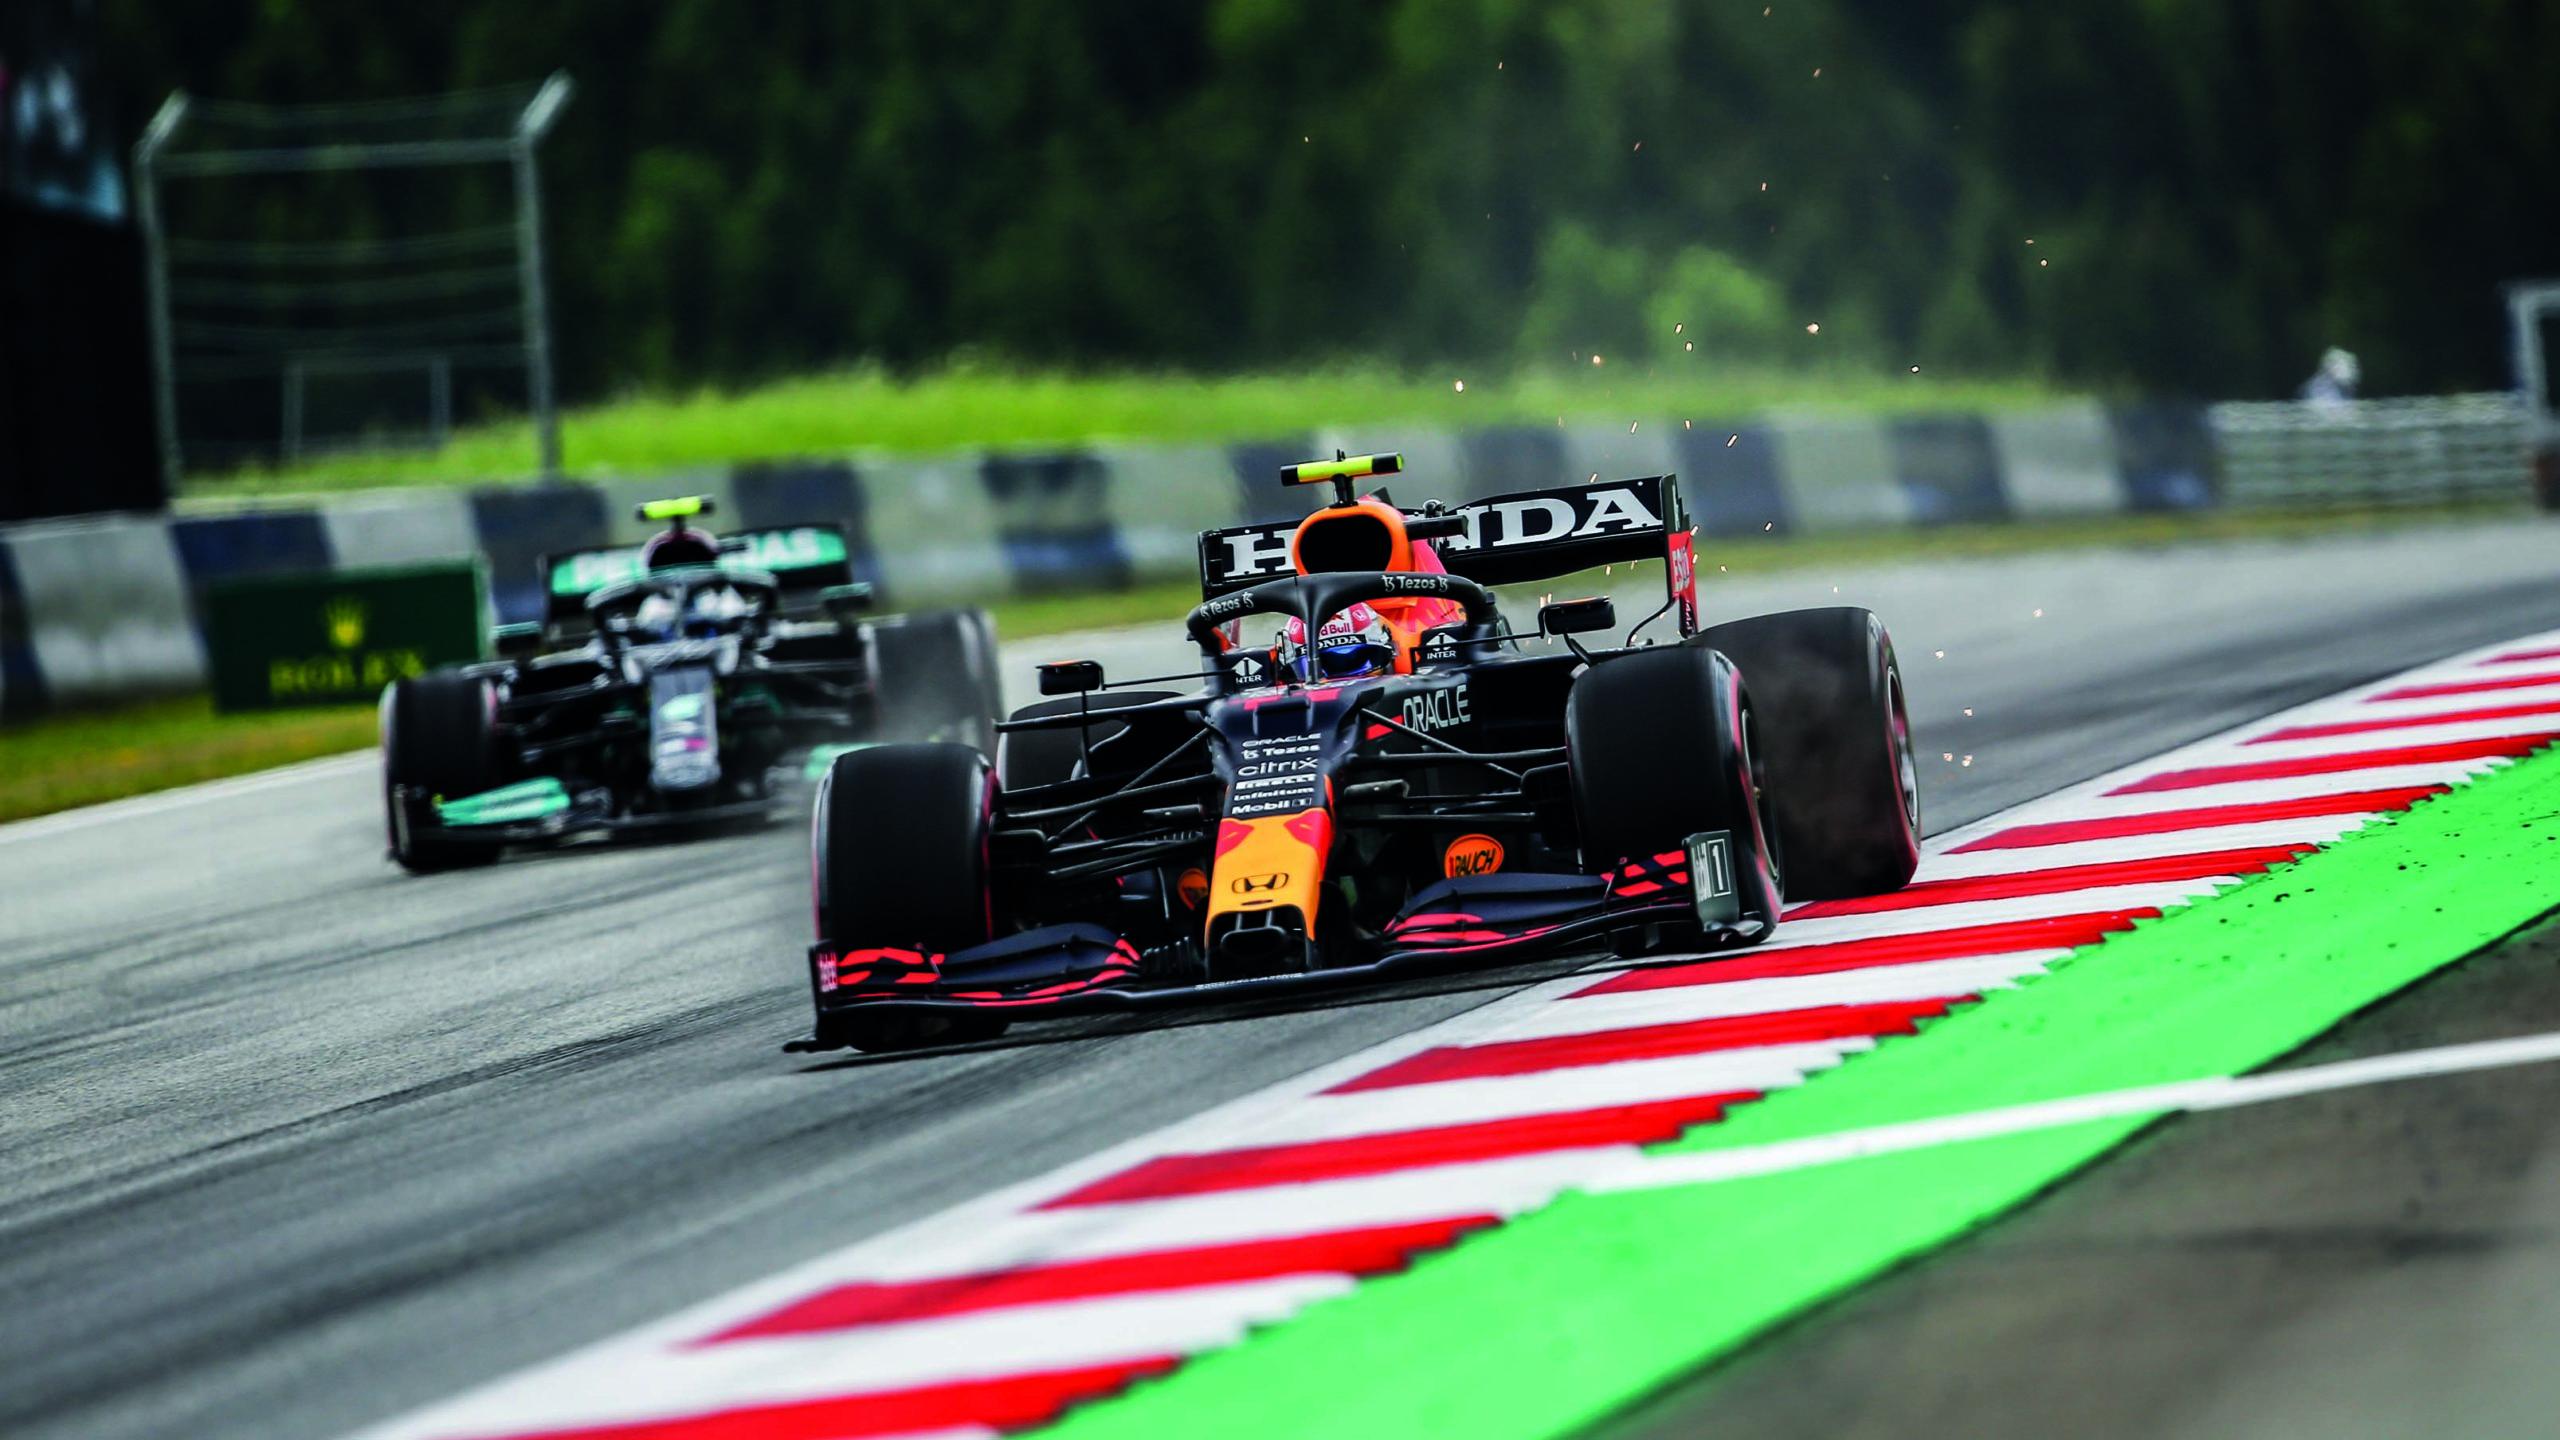 Sergio-Perez-in-practice-for-the-2021-Styrian-Grand-Prix